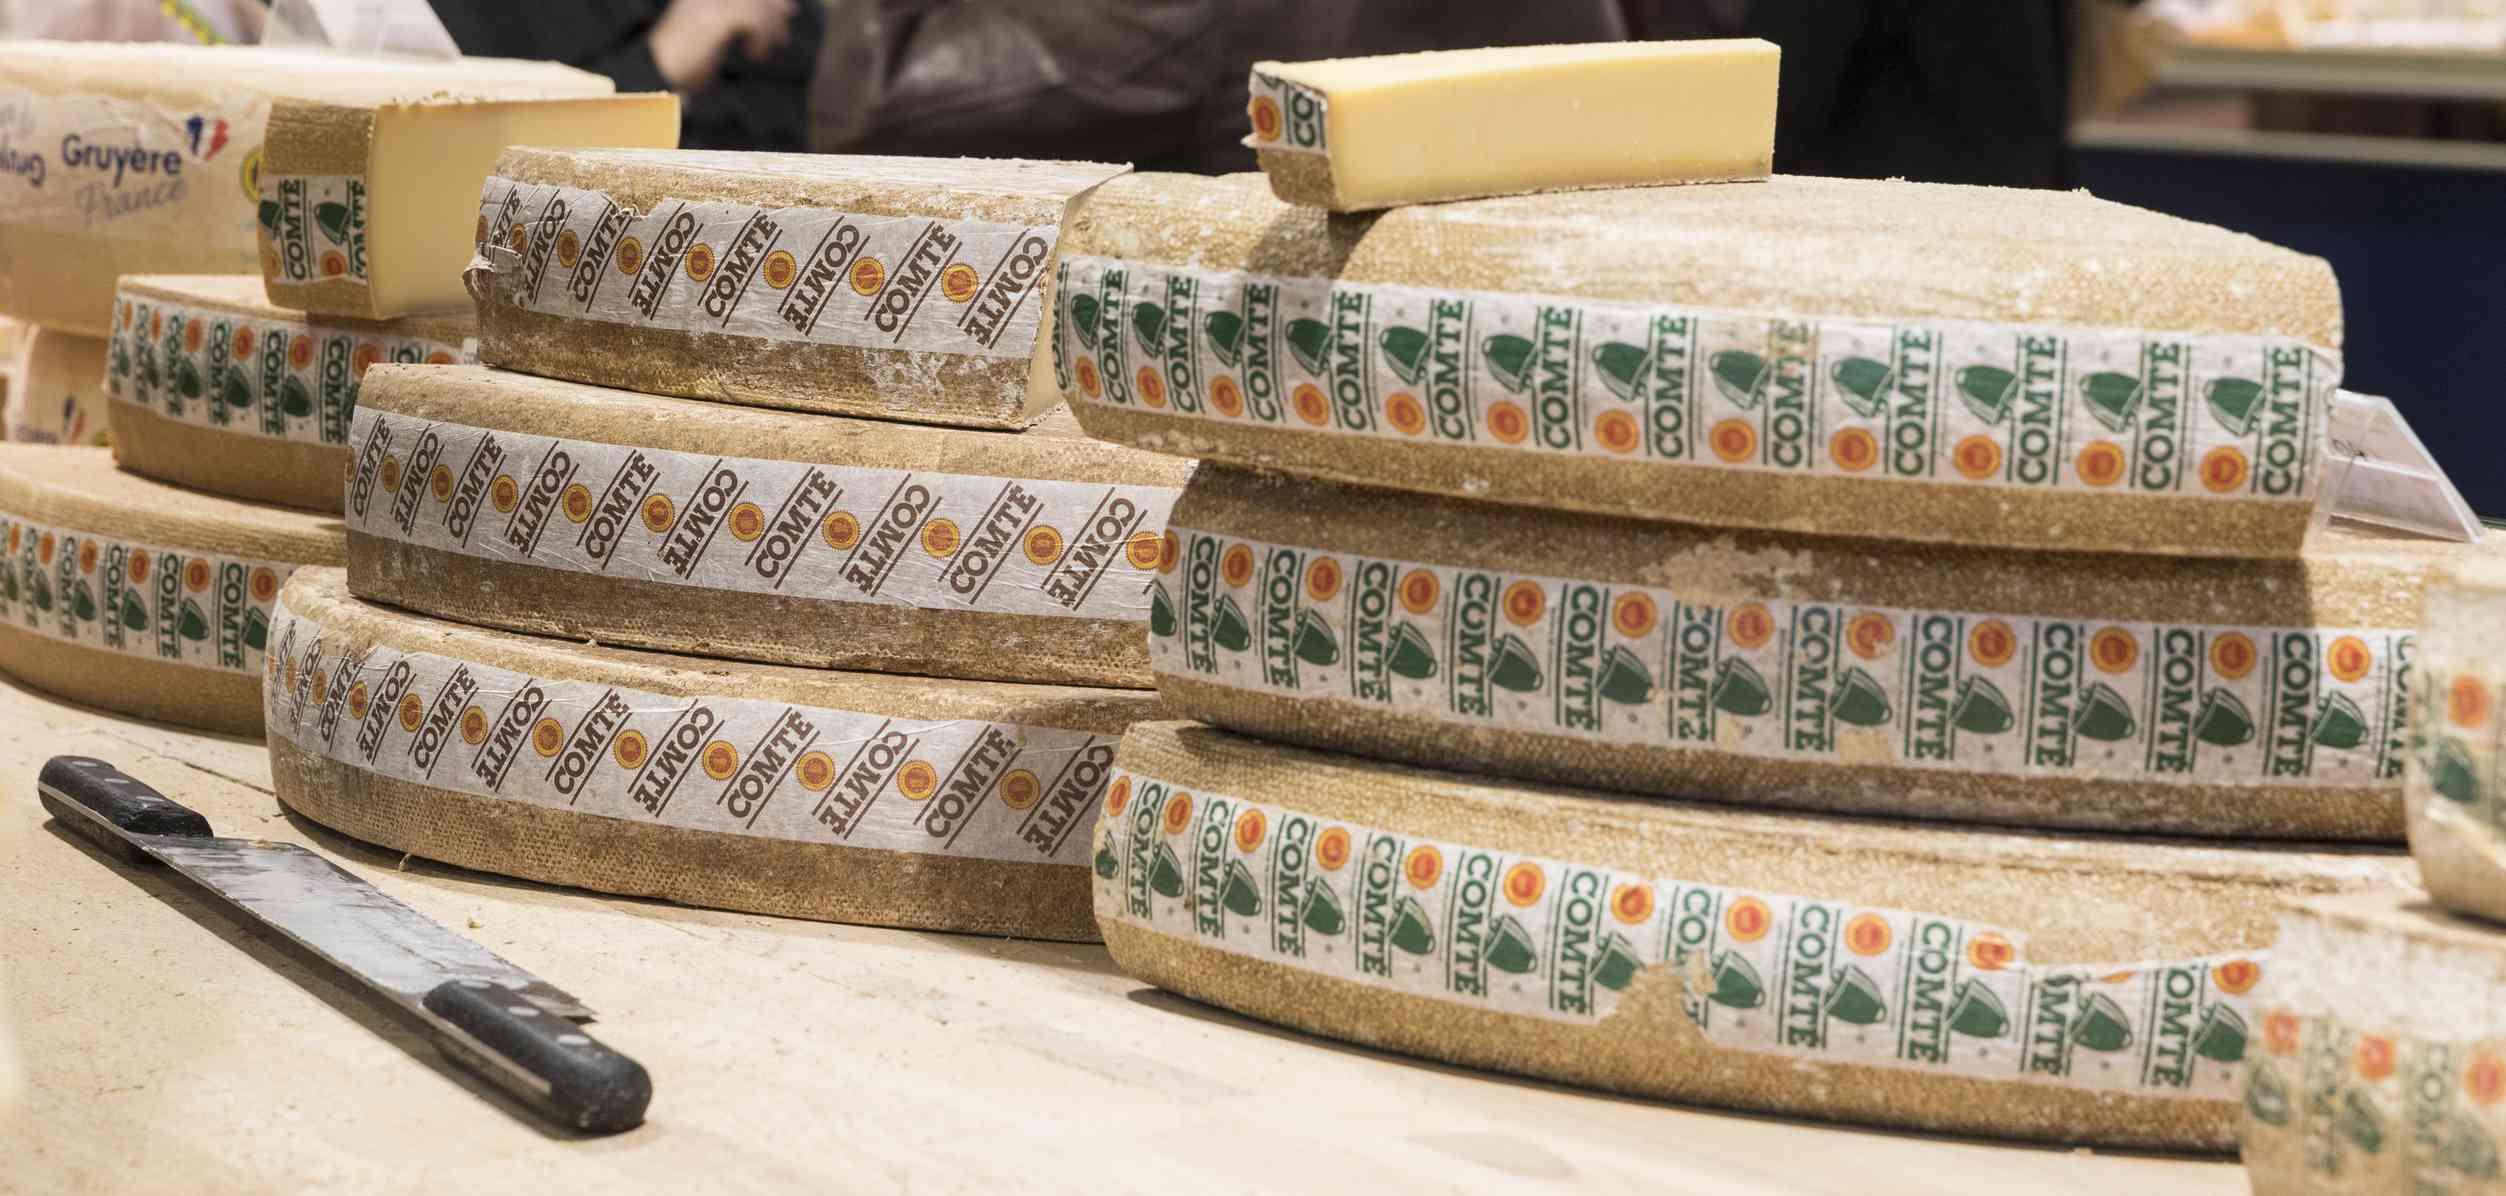 Wheels of Comte cheese